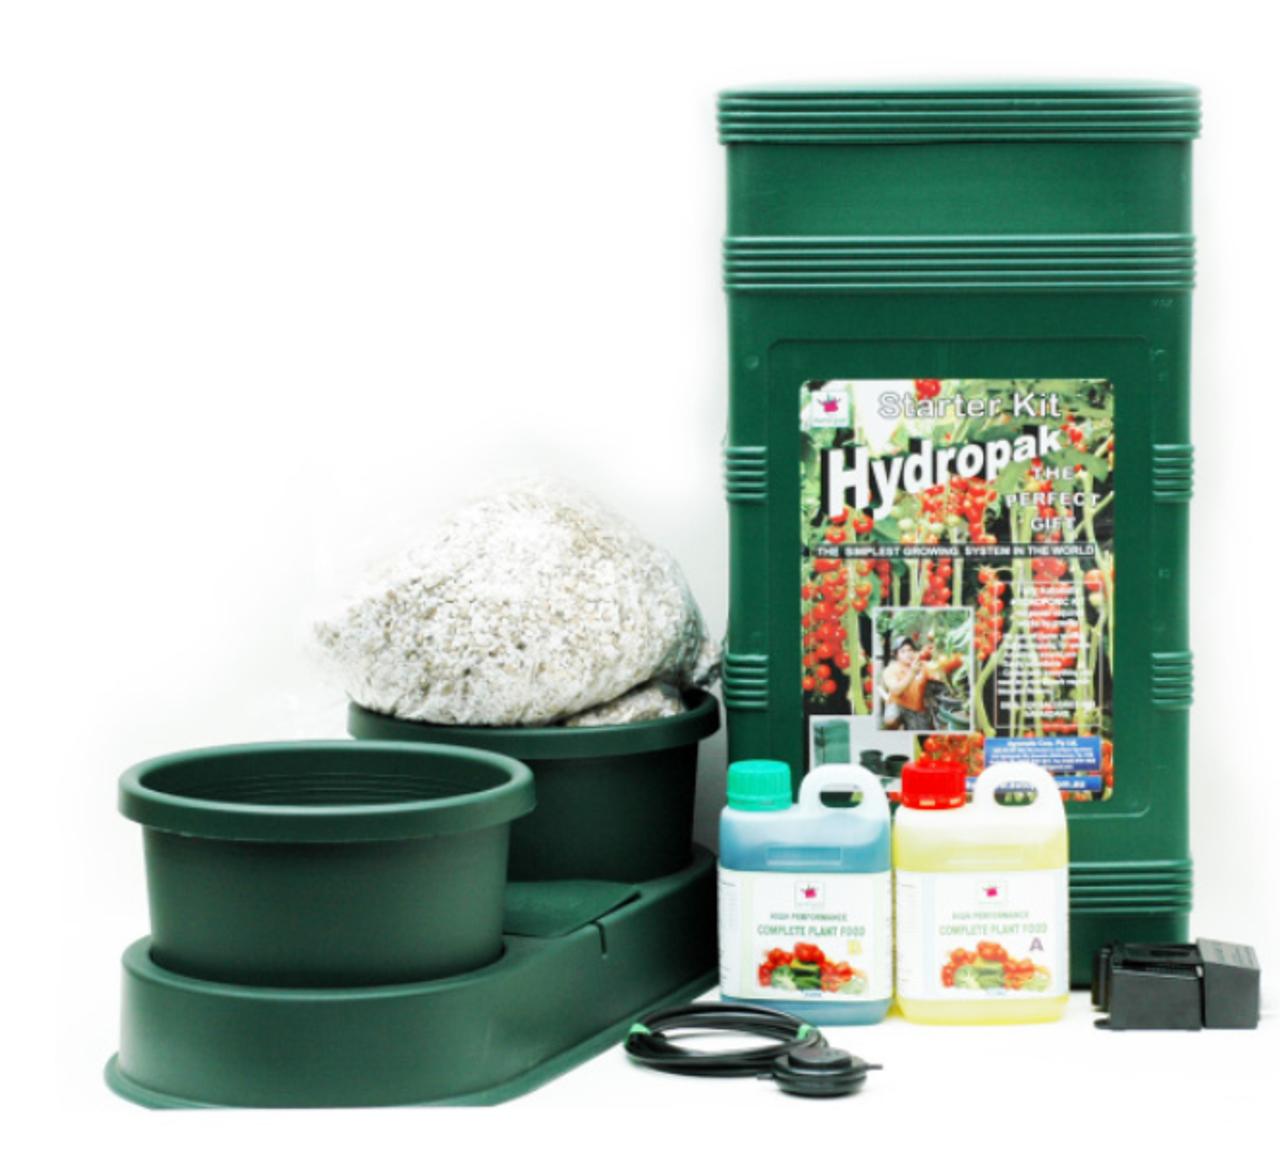 Auto Pot Hydropak